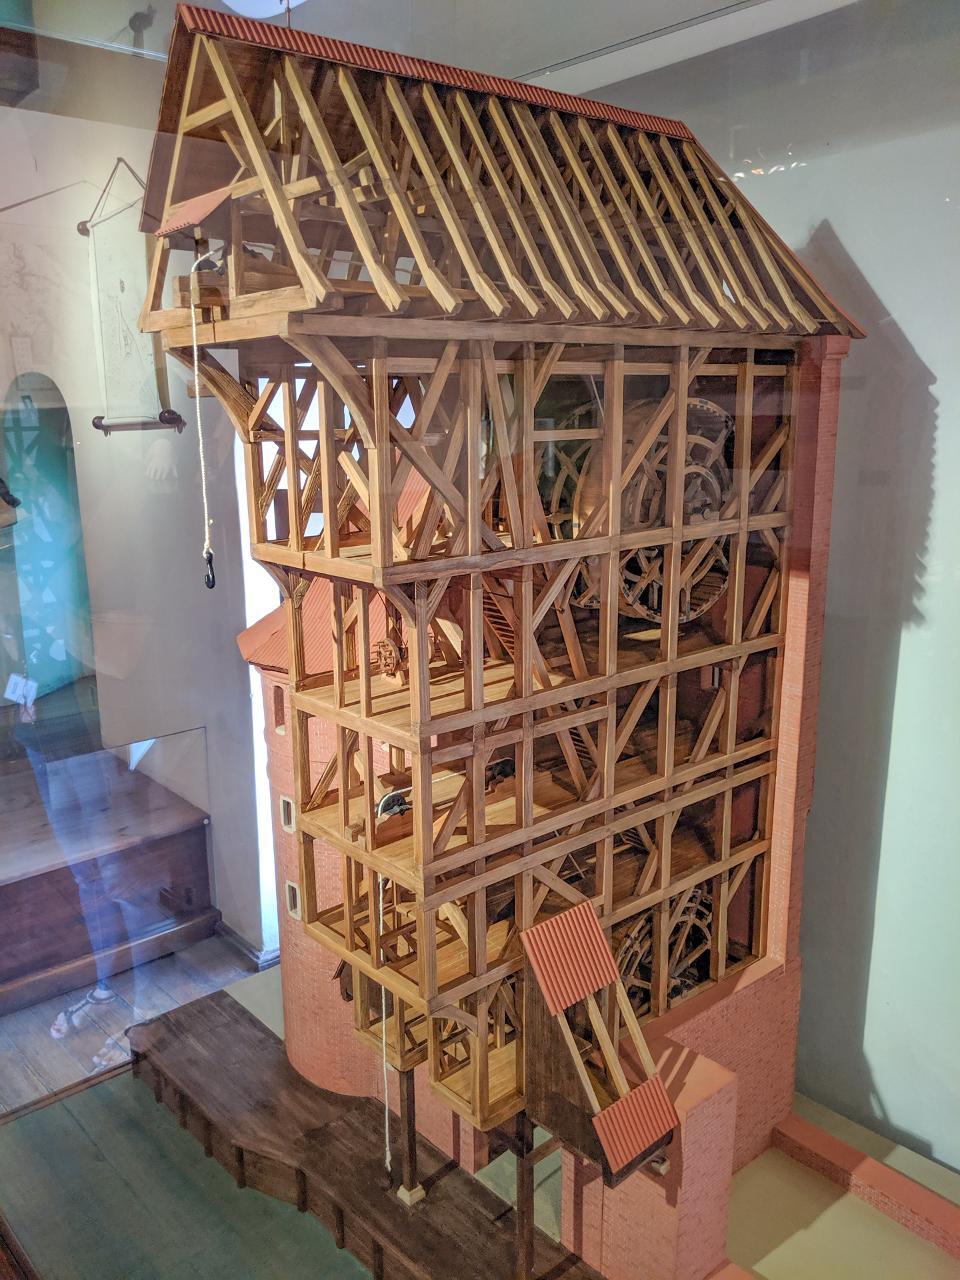 Inside the Gdansk Crane